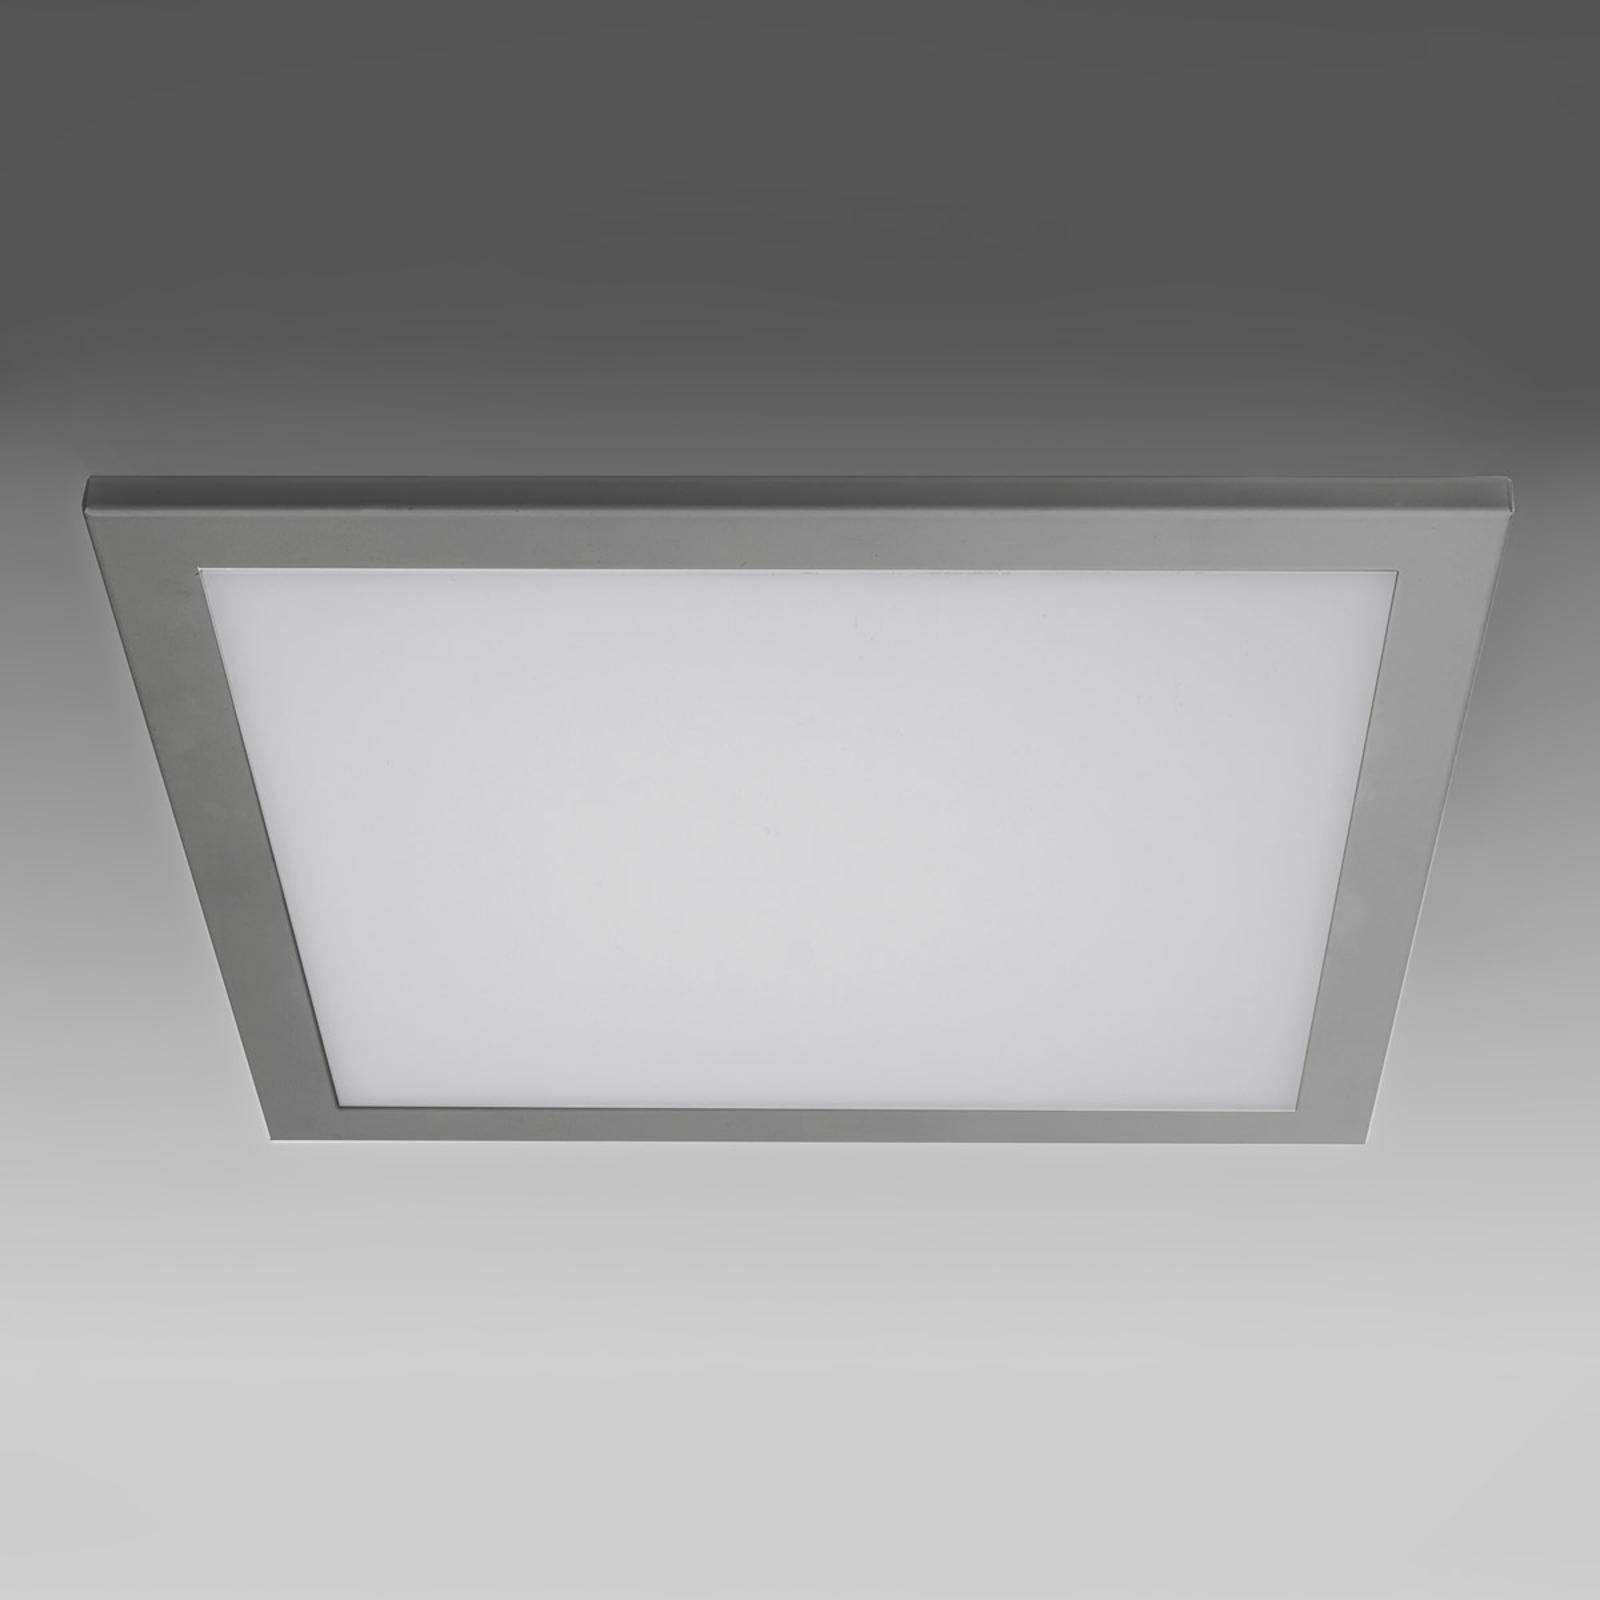 Meget flat SUN 9 LED-downlight i sølv, 3 K